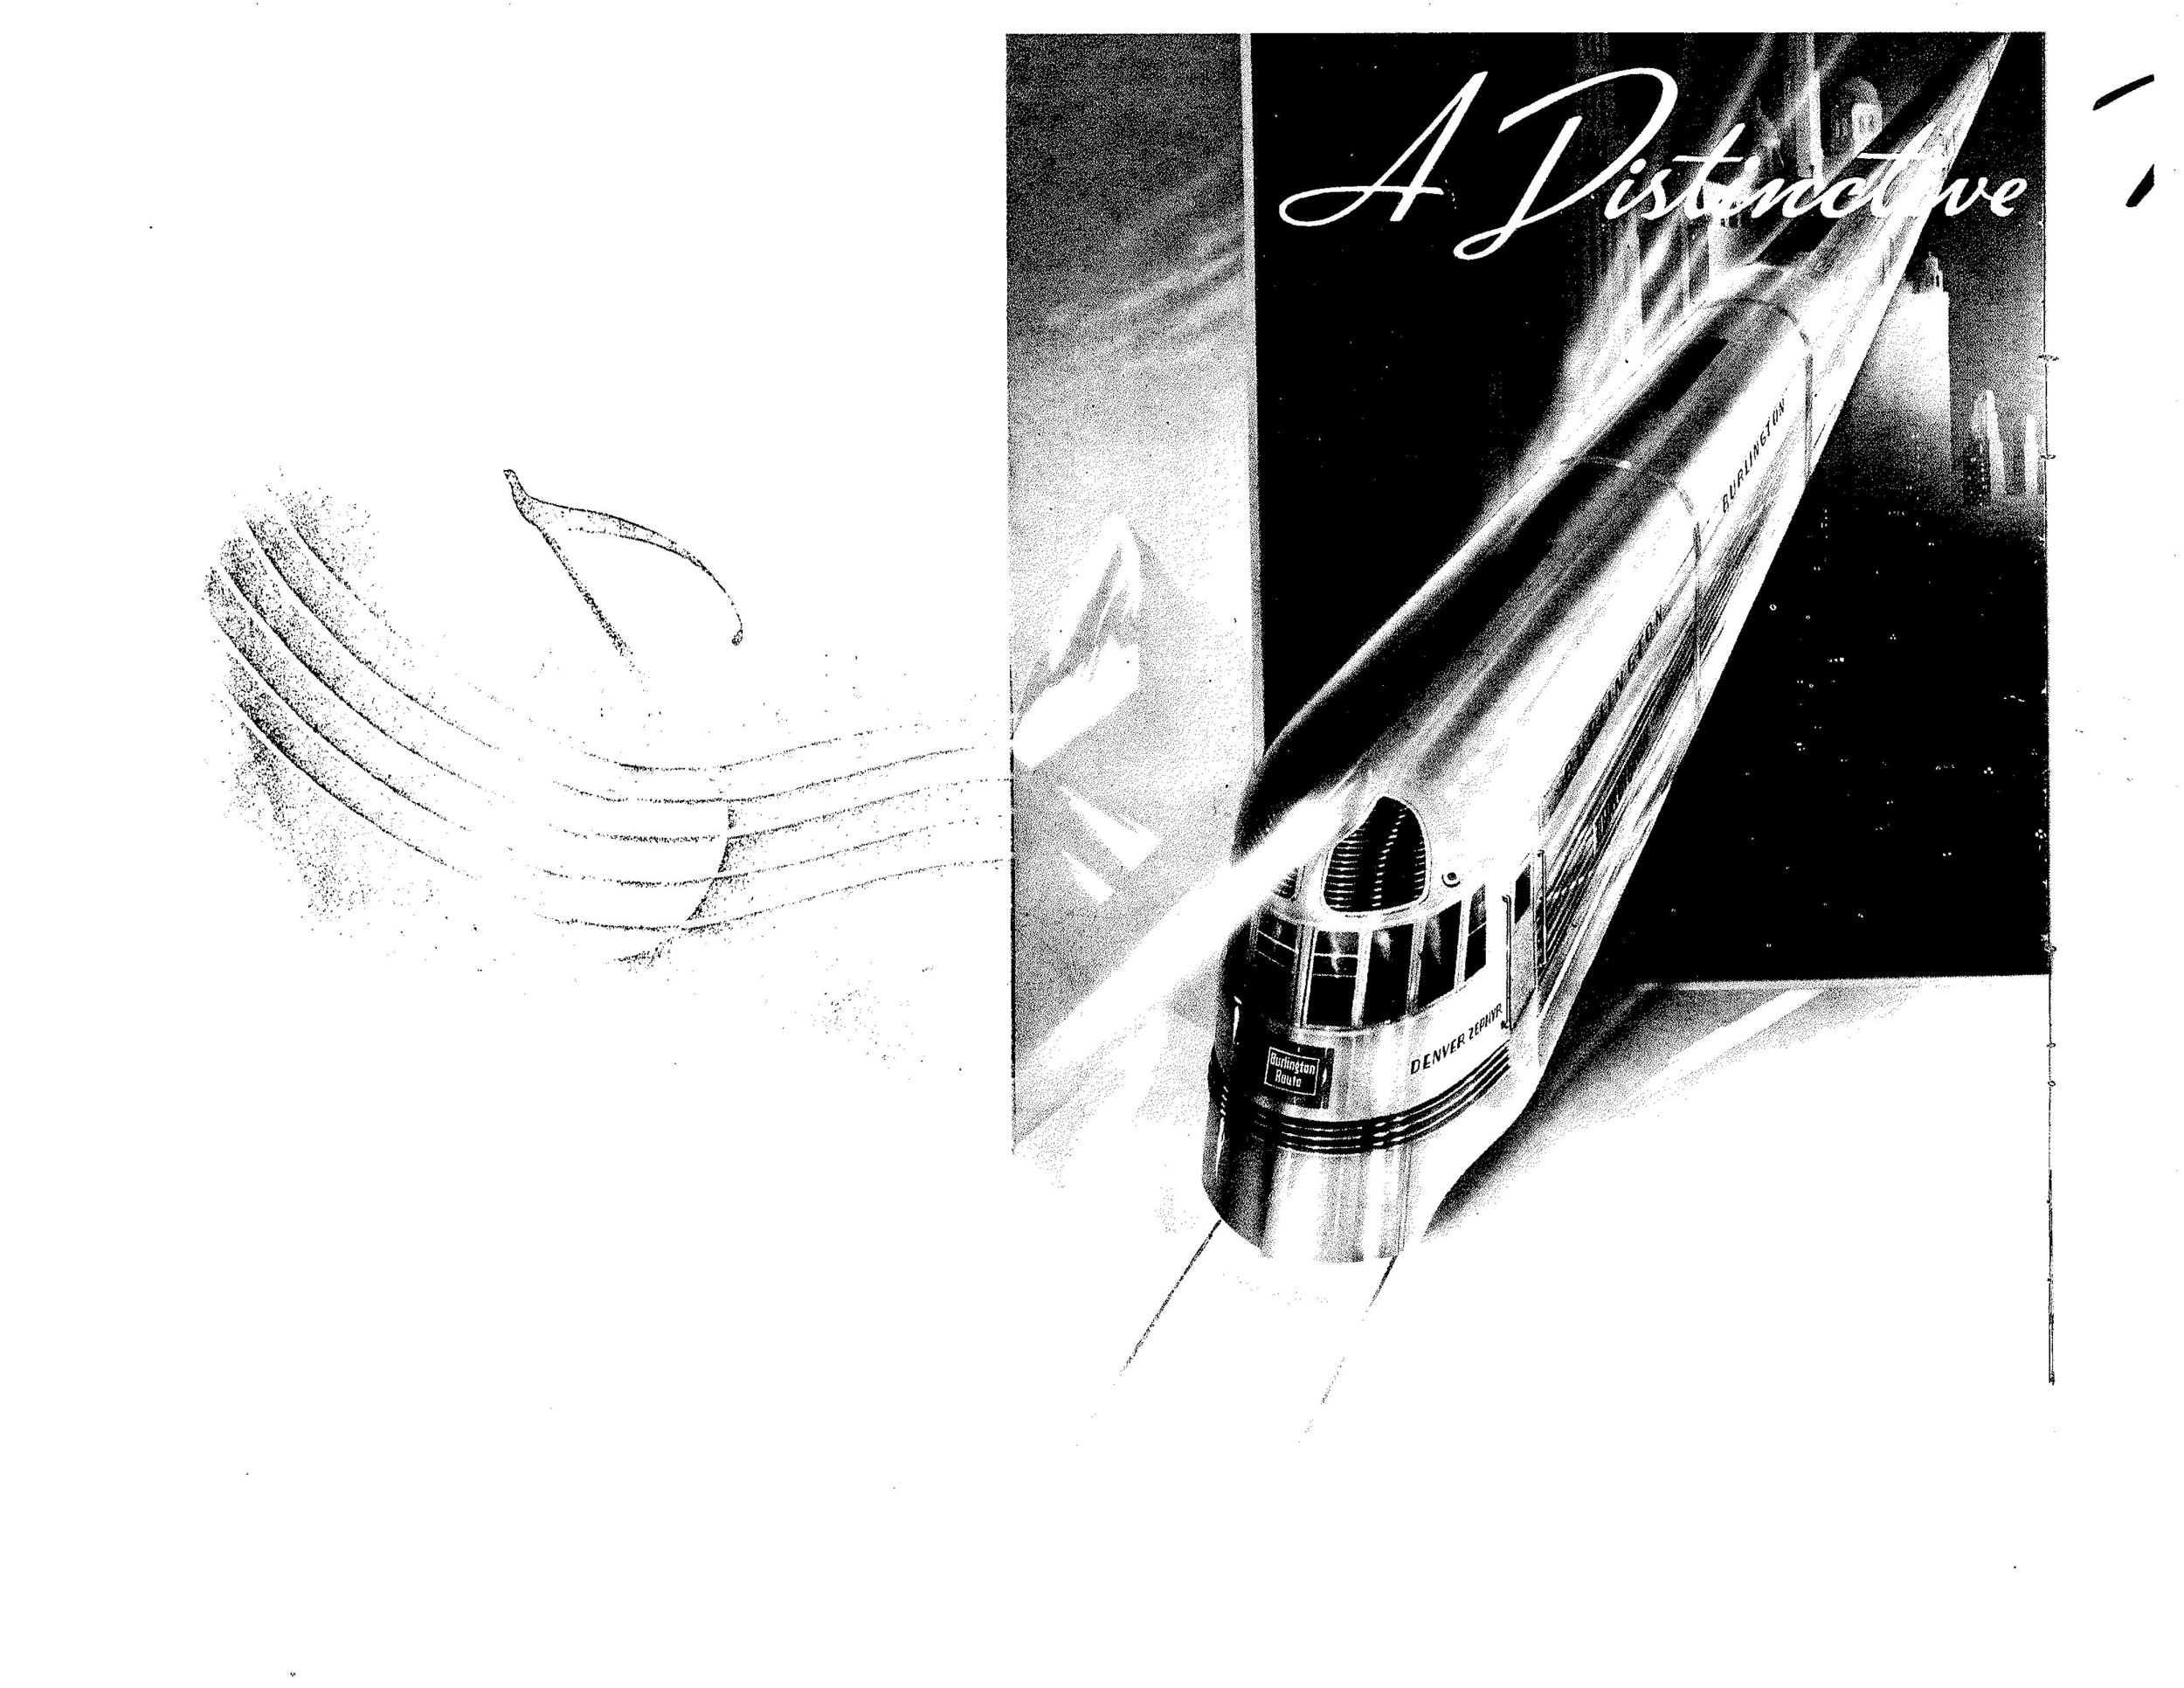 Symphony+In+Stainless+Steel 3.jpg